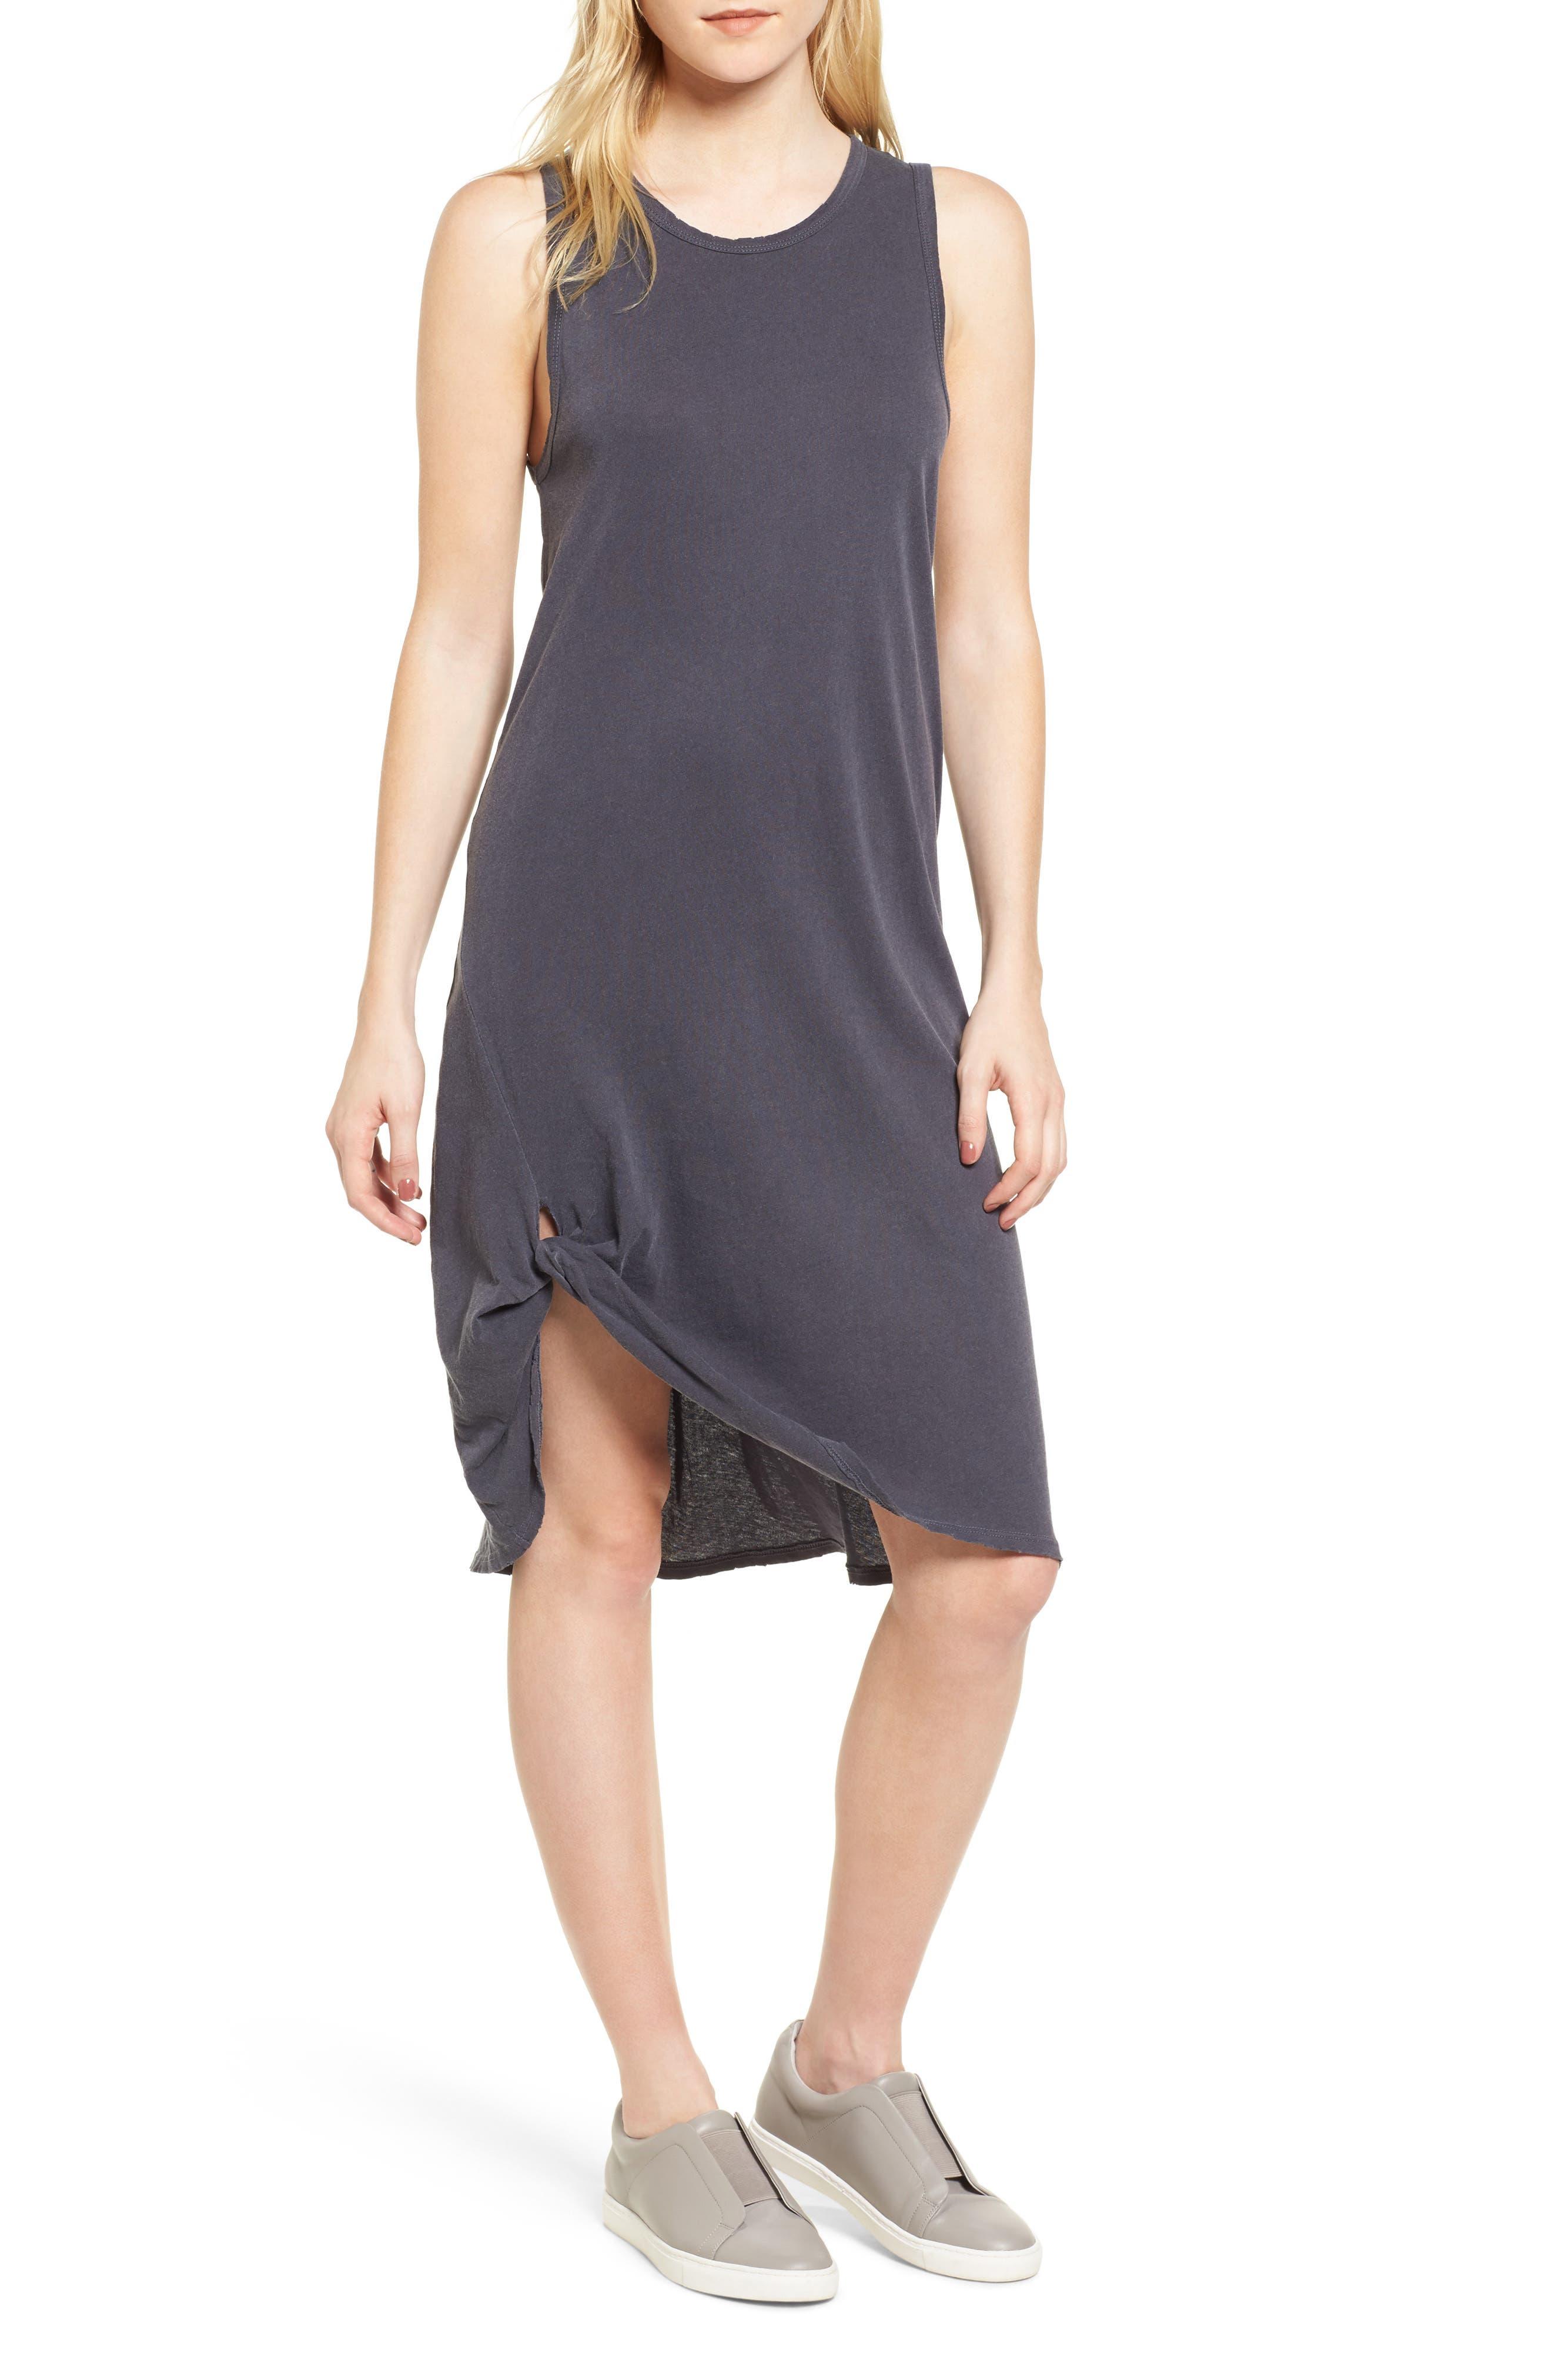 Boo Jersey Tank Dress,                         Main,                         color, Asphalt